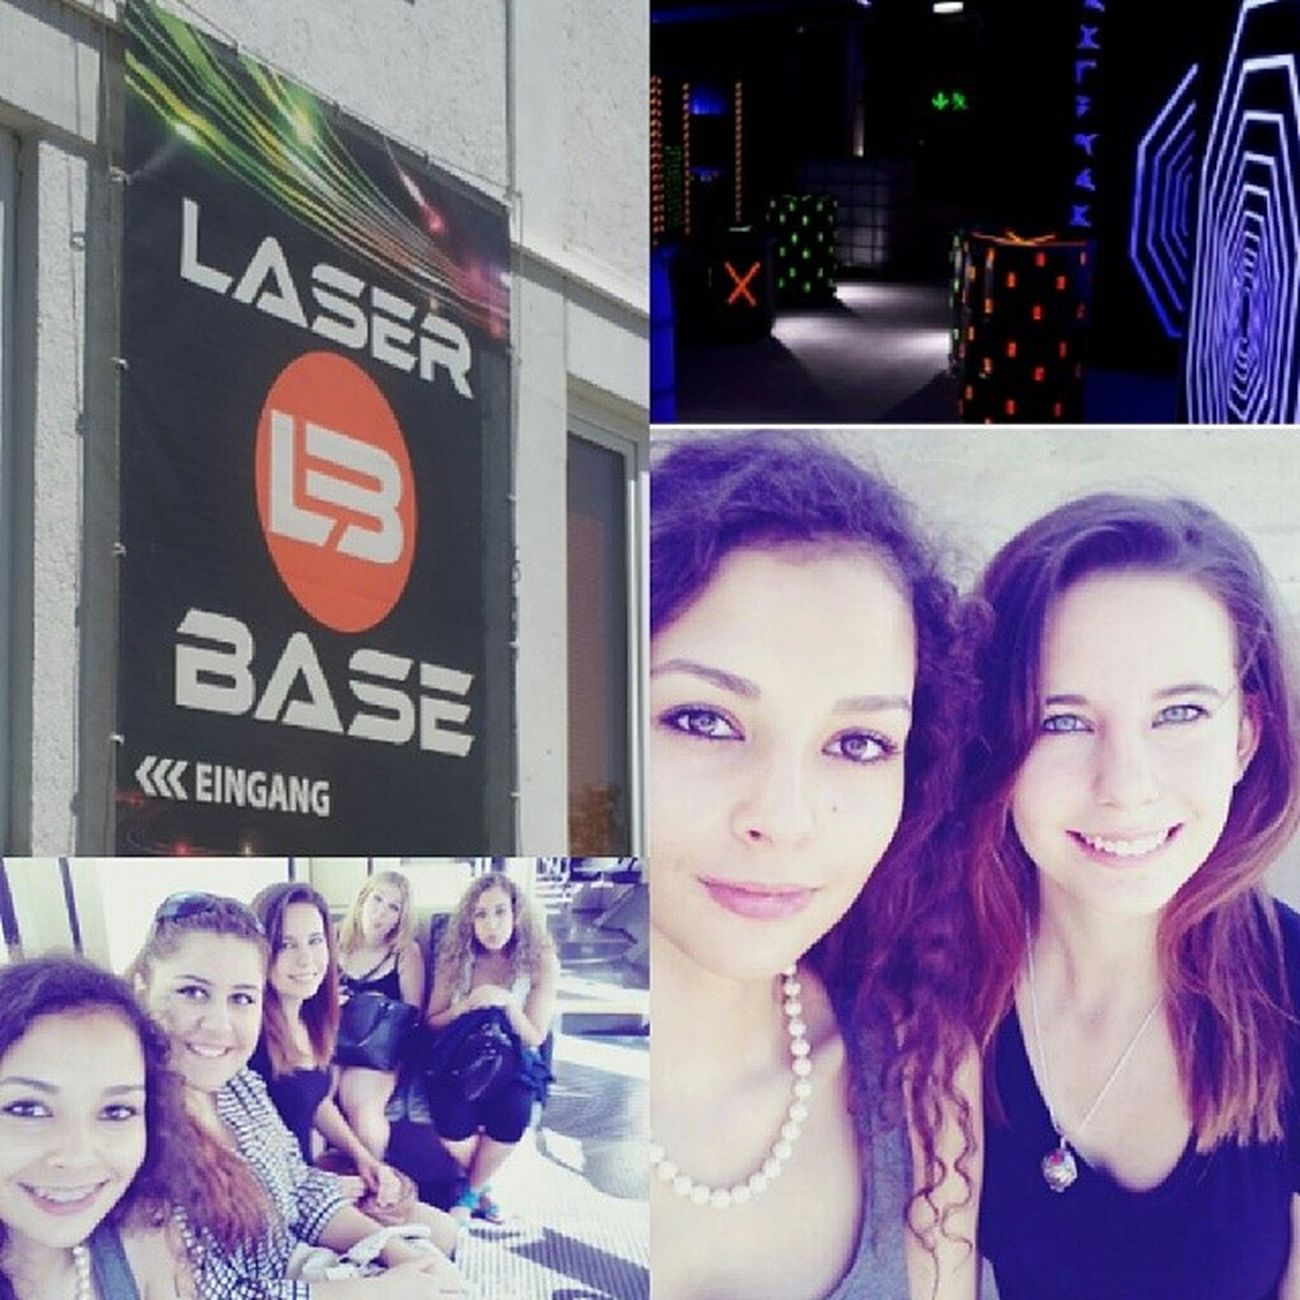 Wuuuuh. Lasertag war sooo geil. *-* @demi_fatima @esroshum_1907 @siciliana_96 @jackyawyeah Laser Lasertag Fun Schießen laserbase